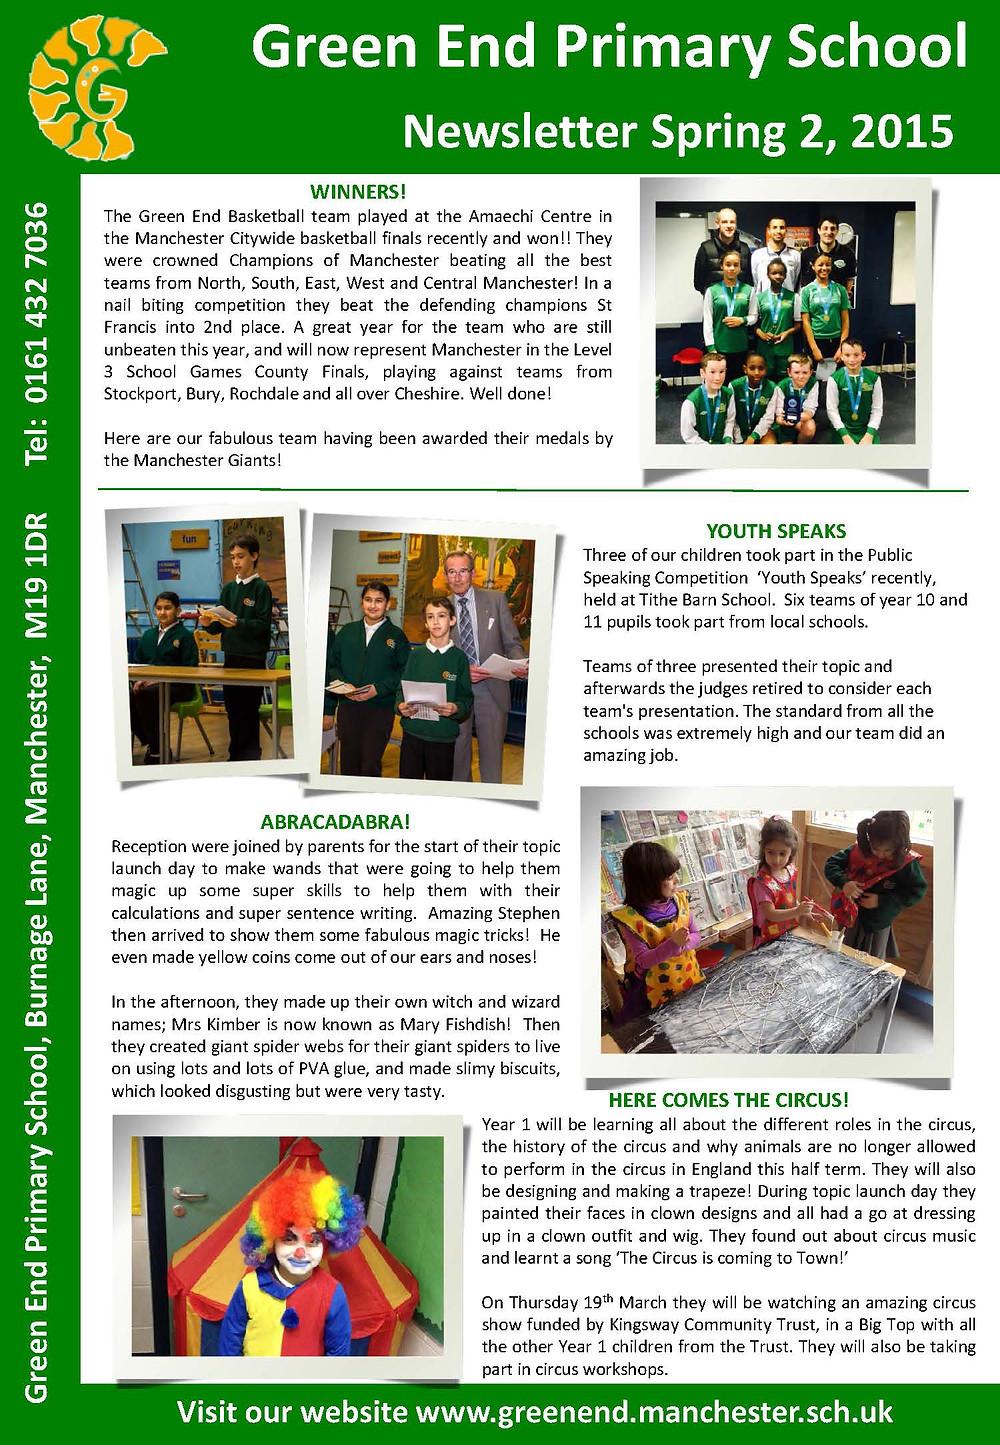 GE Newsletter Spring 2 2015_Page_1.jpg